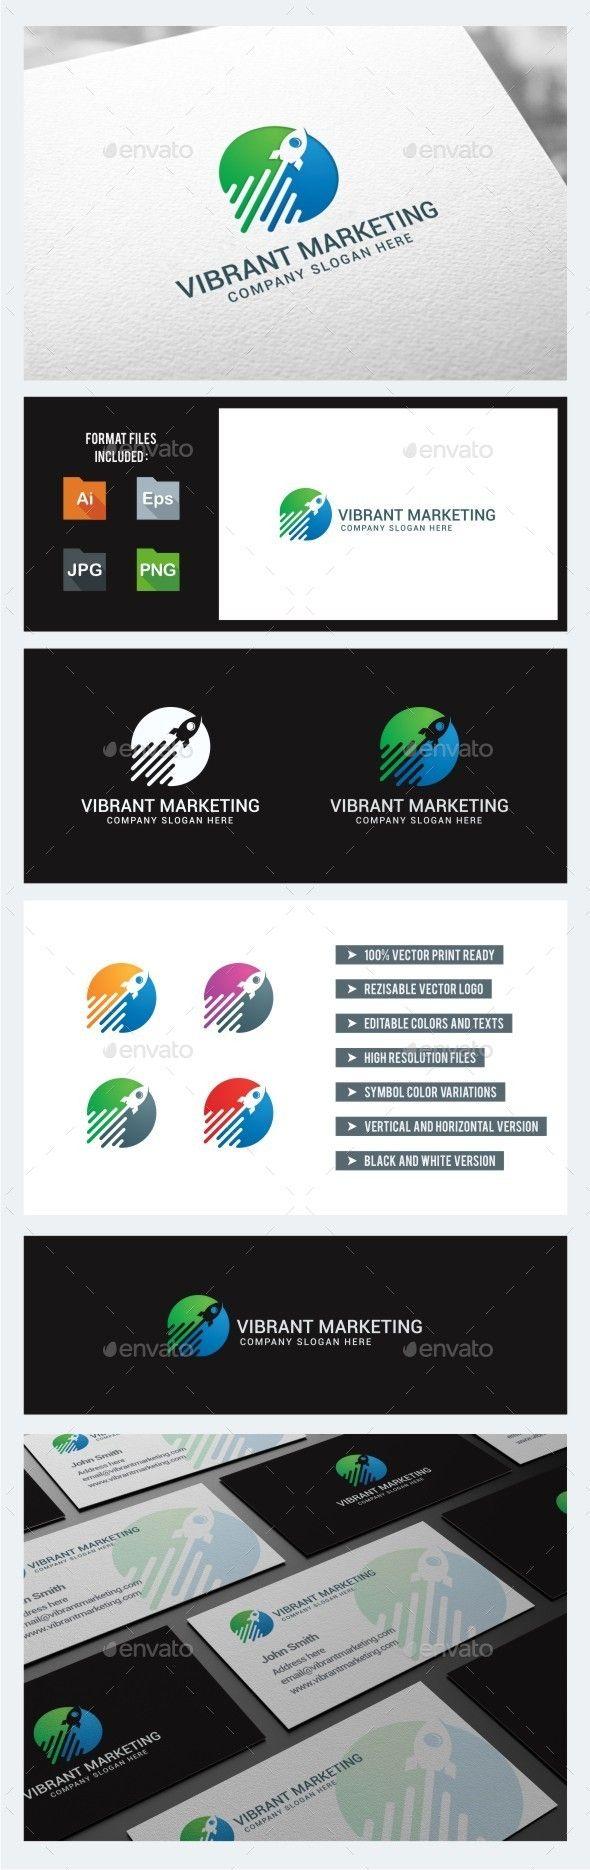 Vibrant Marketing Rocket  - Logo Design Template Vector #logotype Download it here: http://graphicriver.net/item/vibrant-marketing-rocket-logo-template/10779523?s_rank=1409?ref=nesto